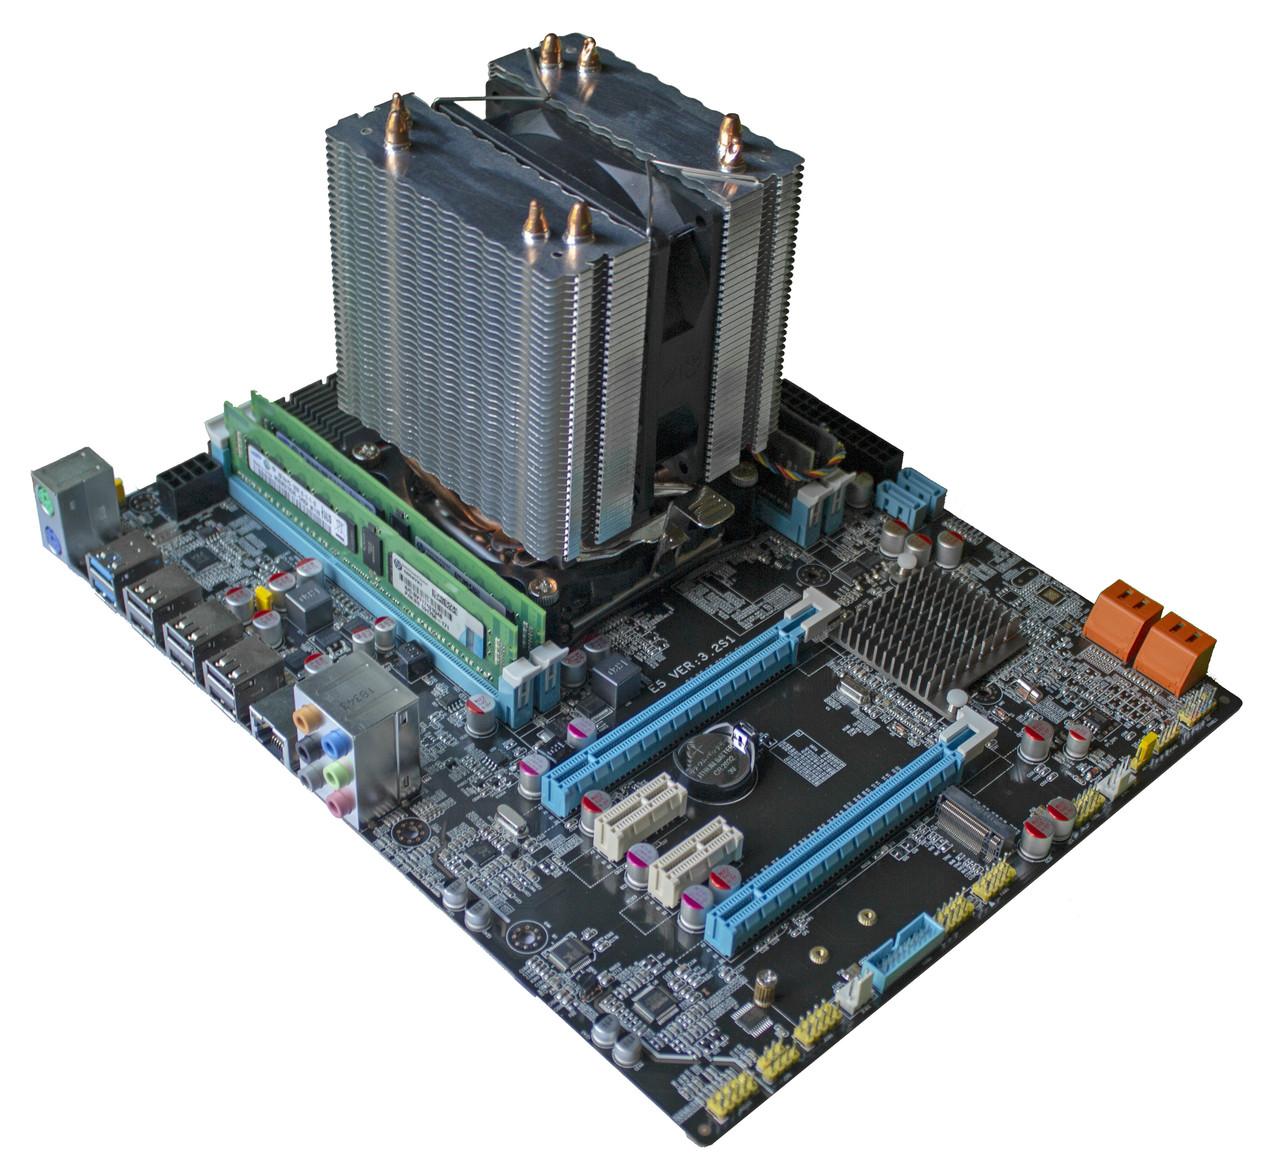 Комплект X79Z-2.4F + Xeon E5-2670v2 + 16 GB RAM + Кулер, LGA 2011